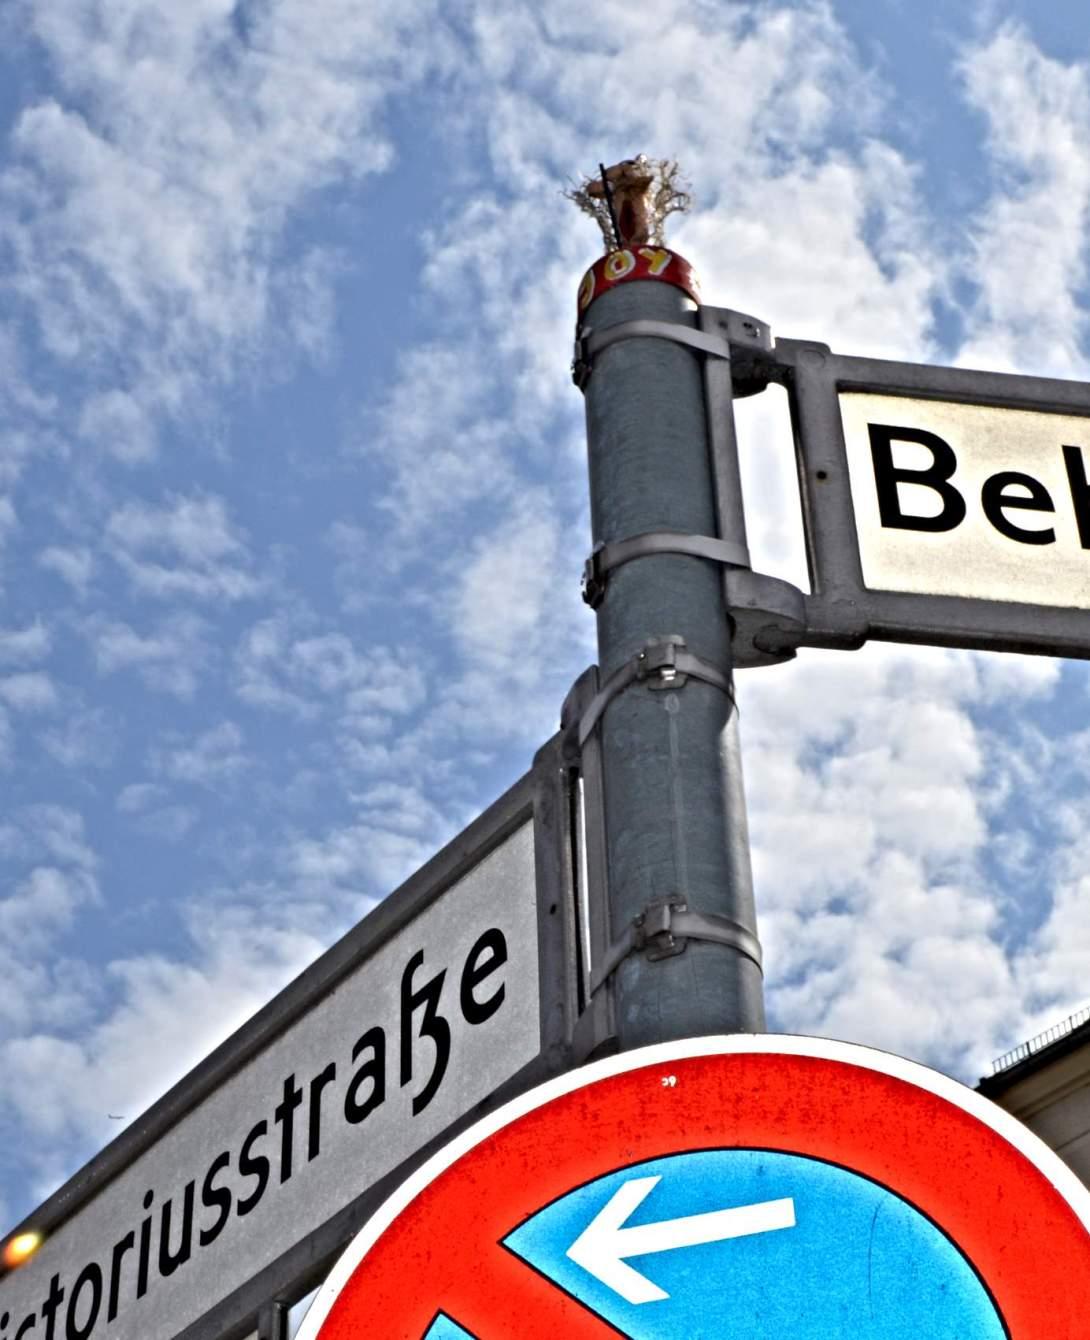 street yogis of Berlin streetart be kitschig blog